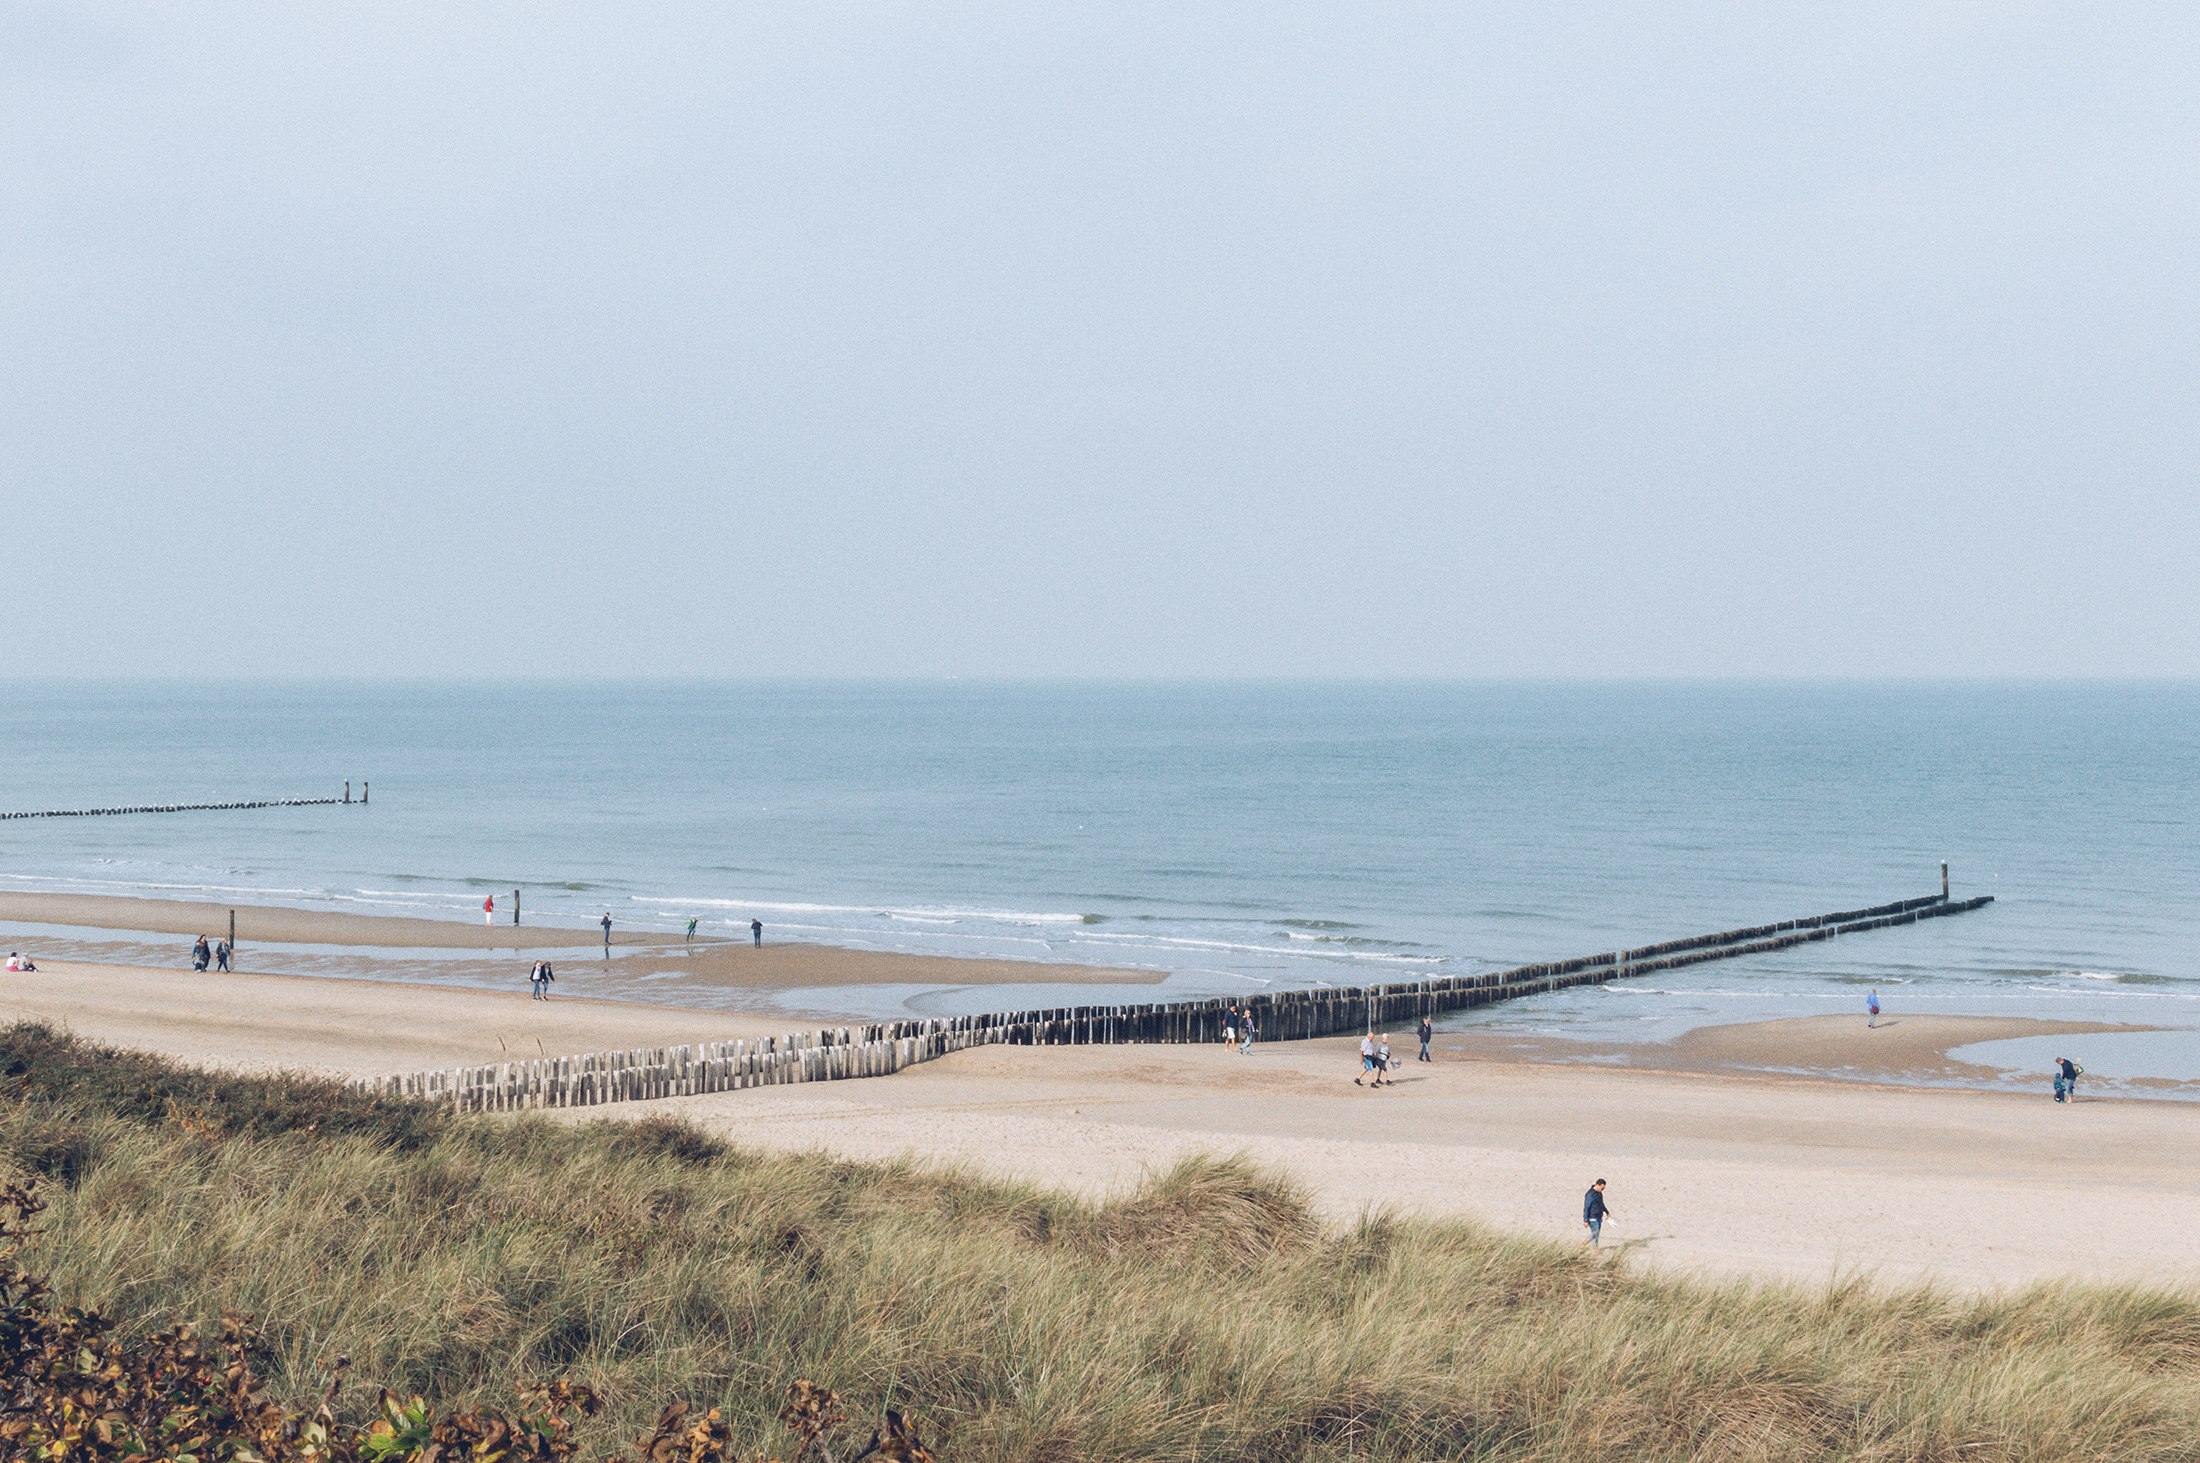 Domburgo seaside Beach Netherlands.jpg